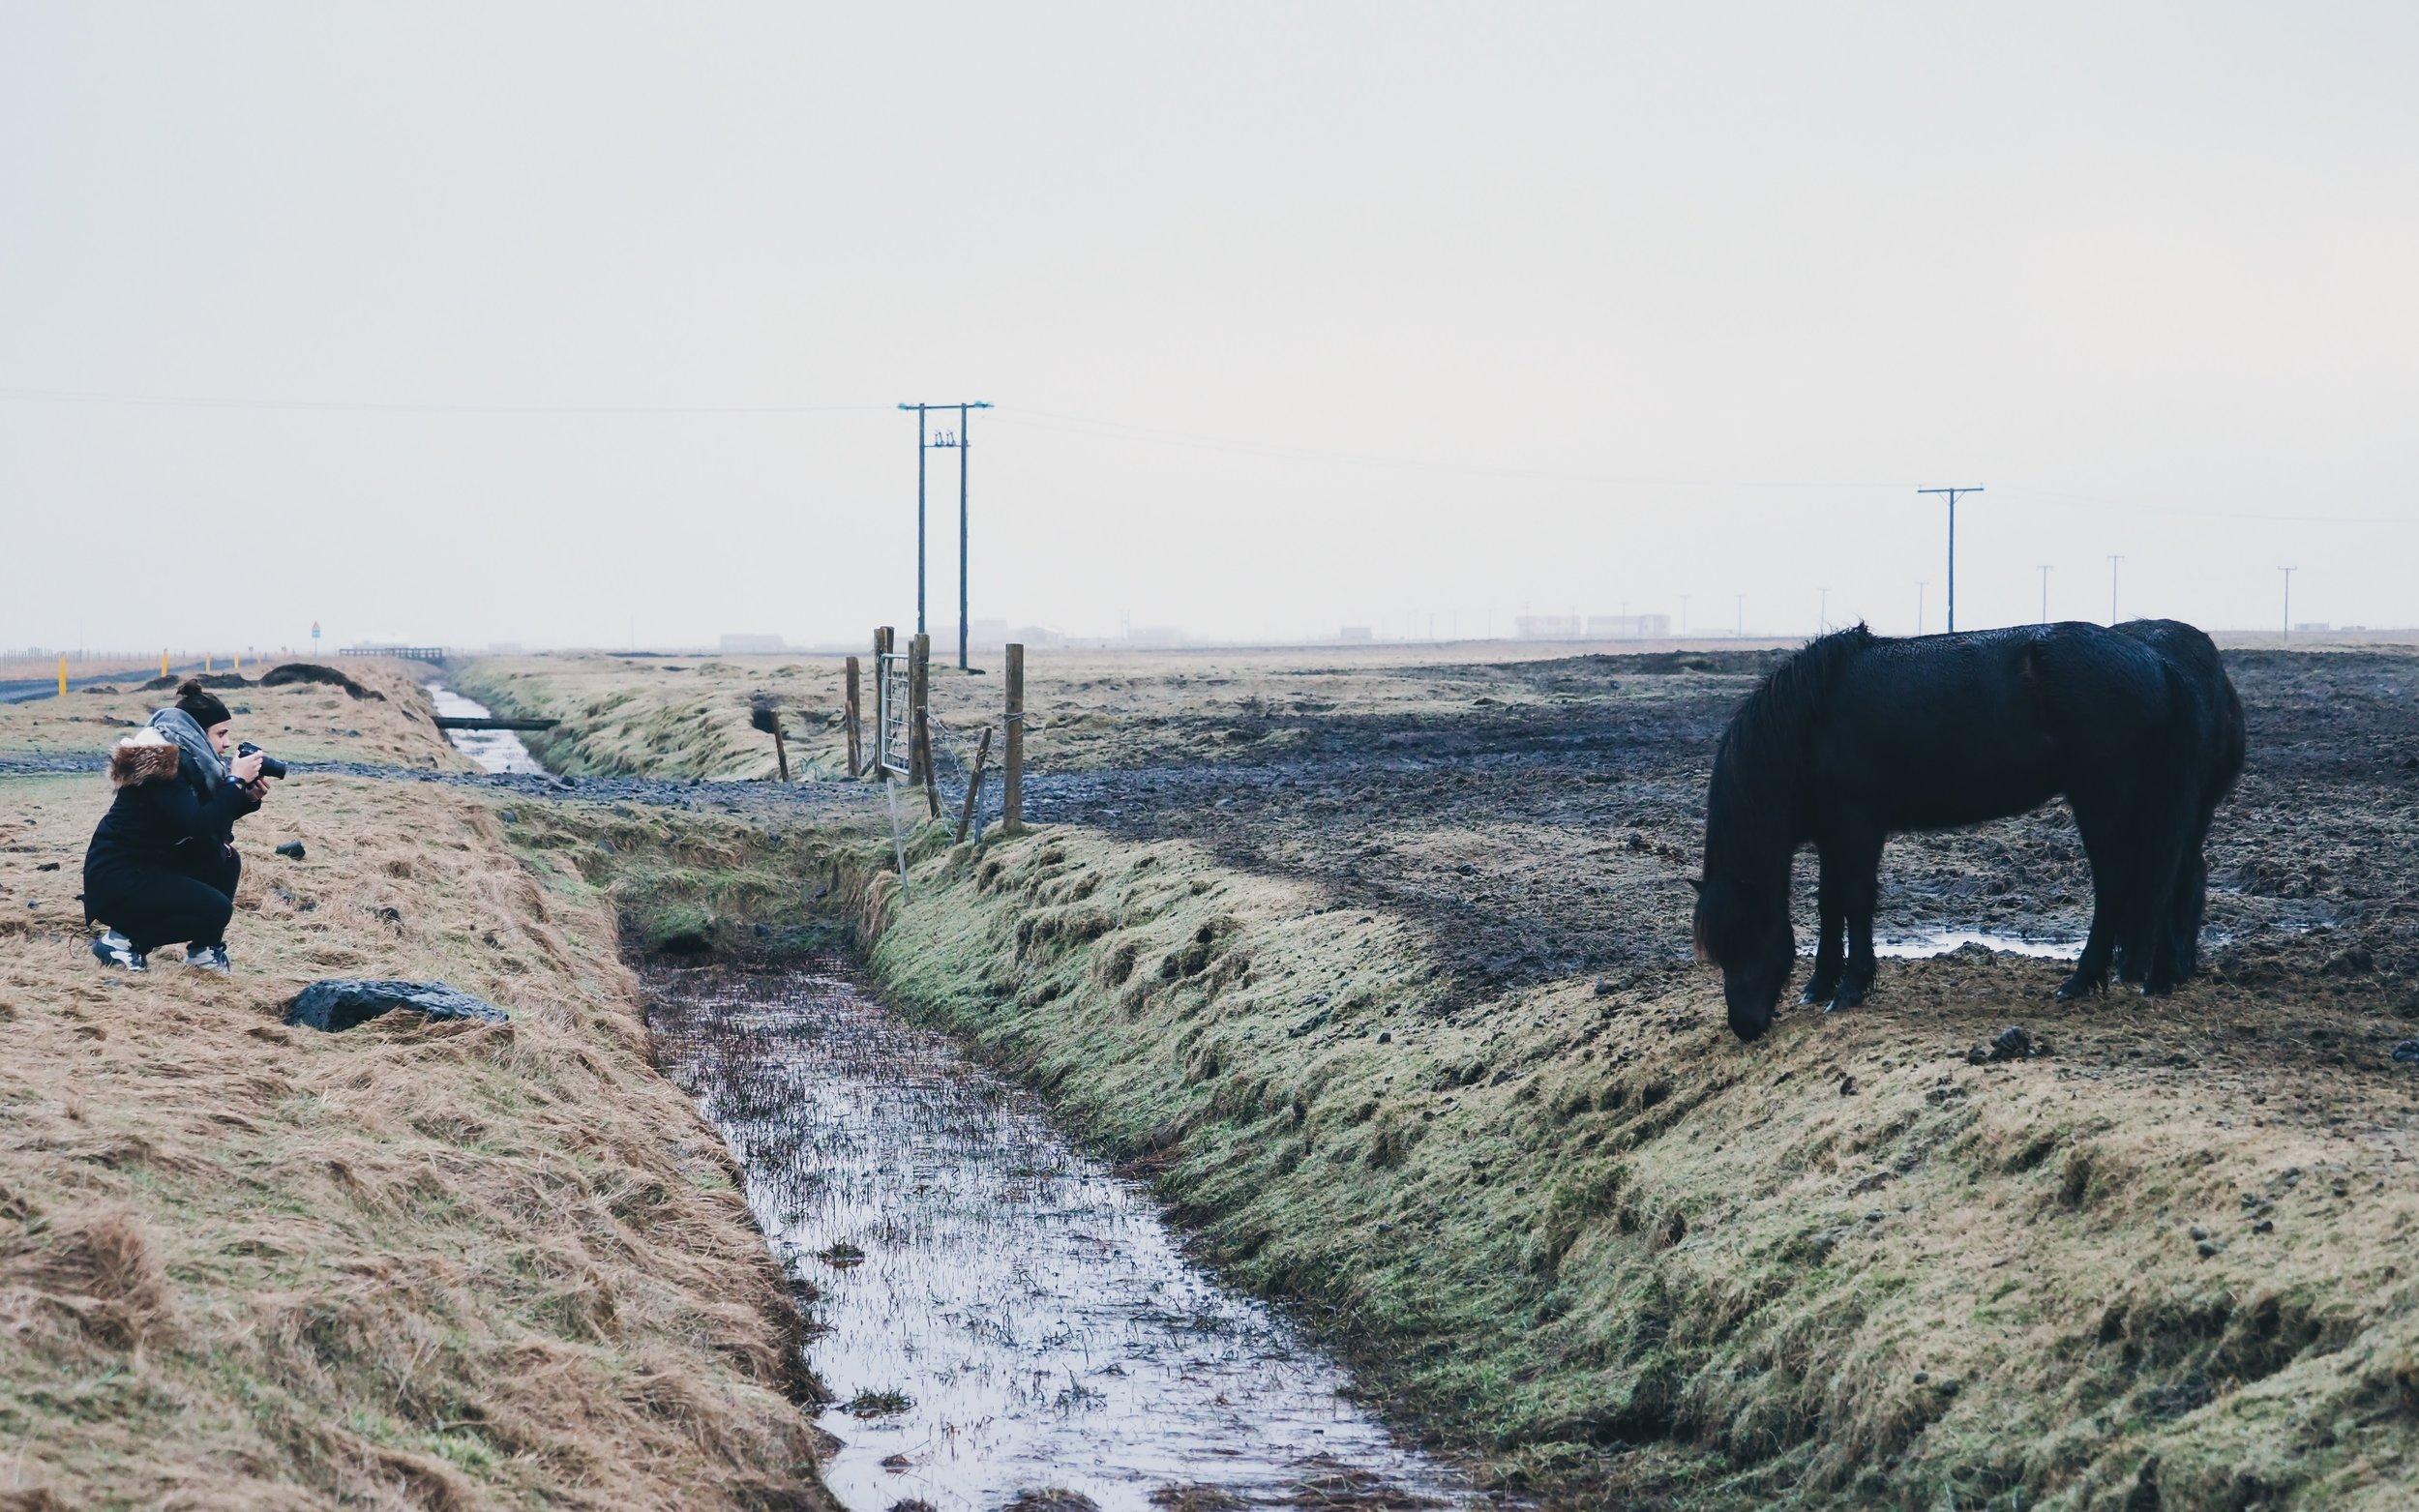 Taken in Rangarvallasysla, Iceland on February 19.